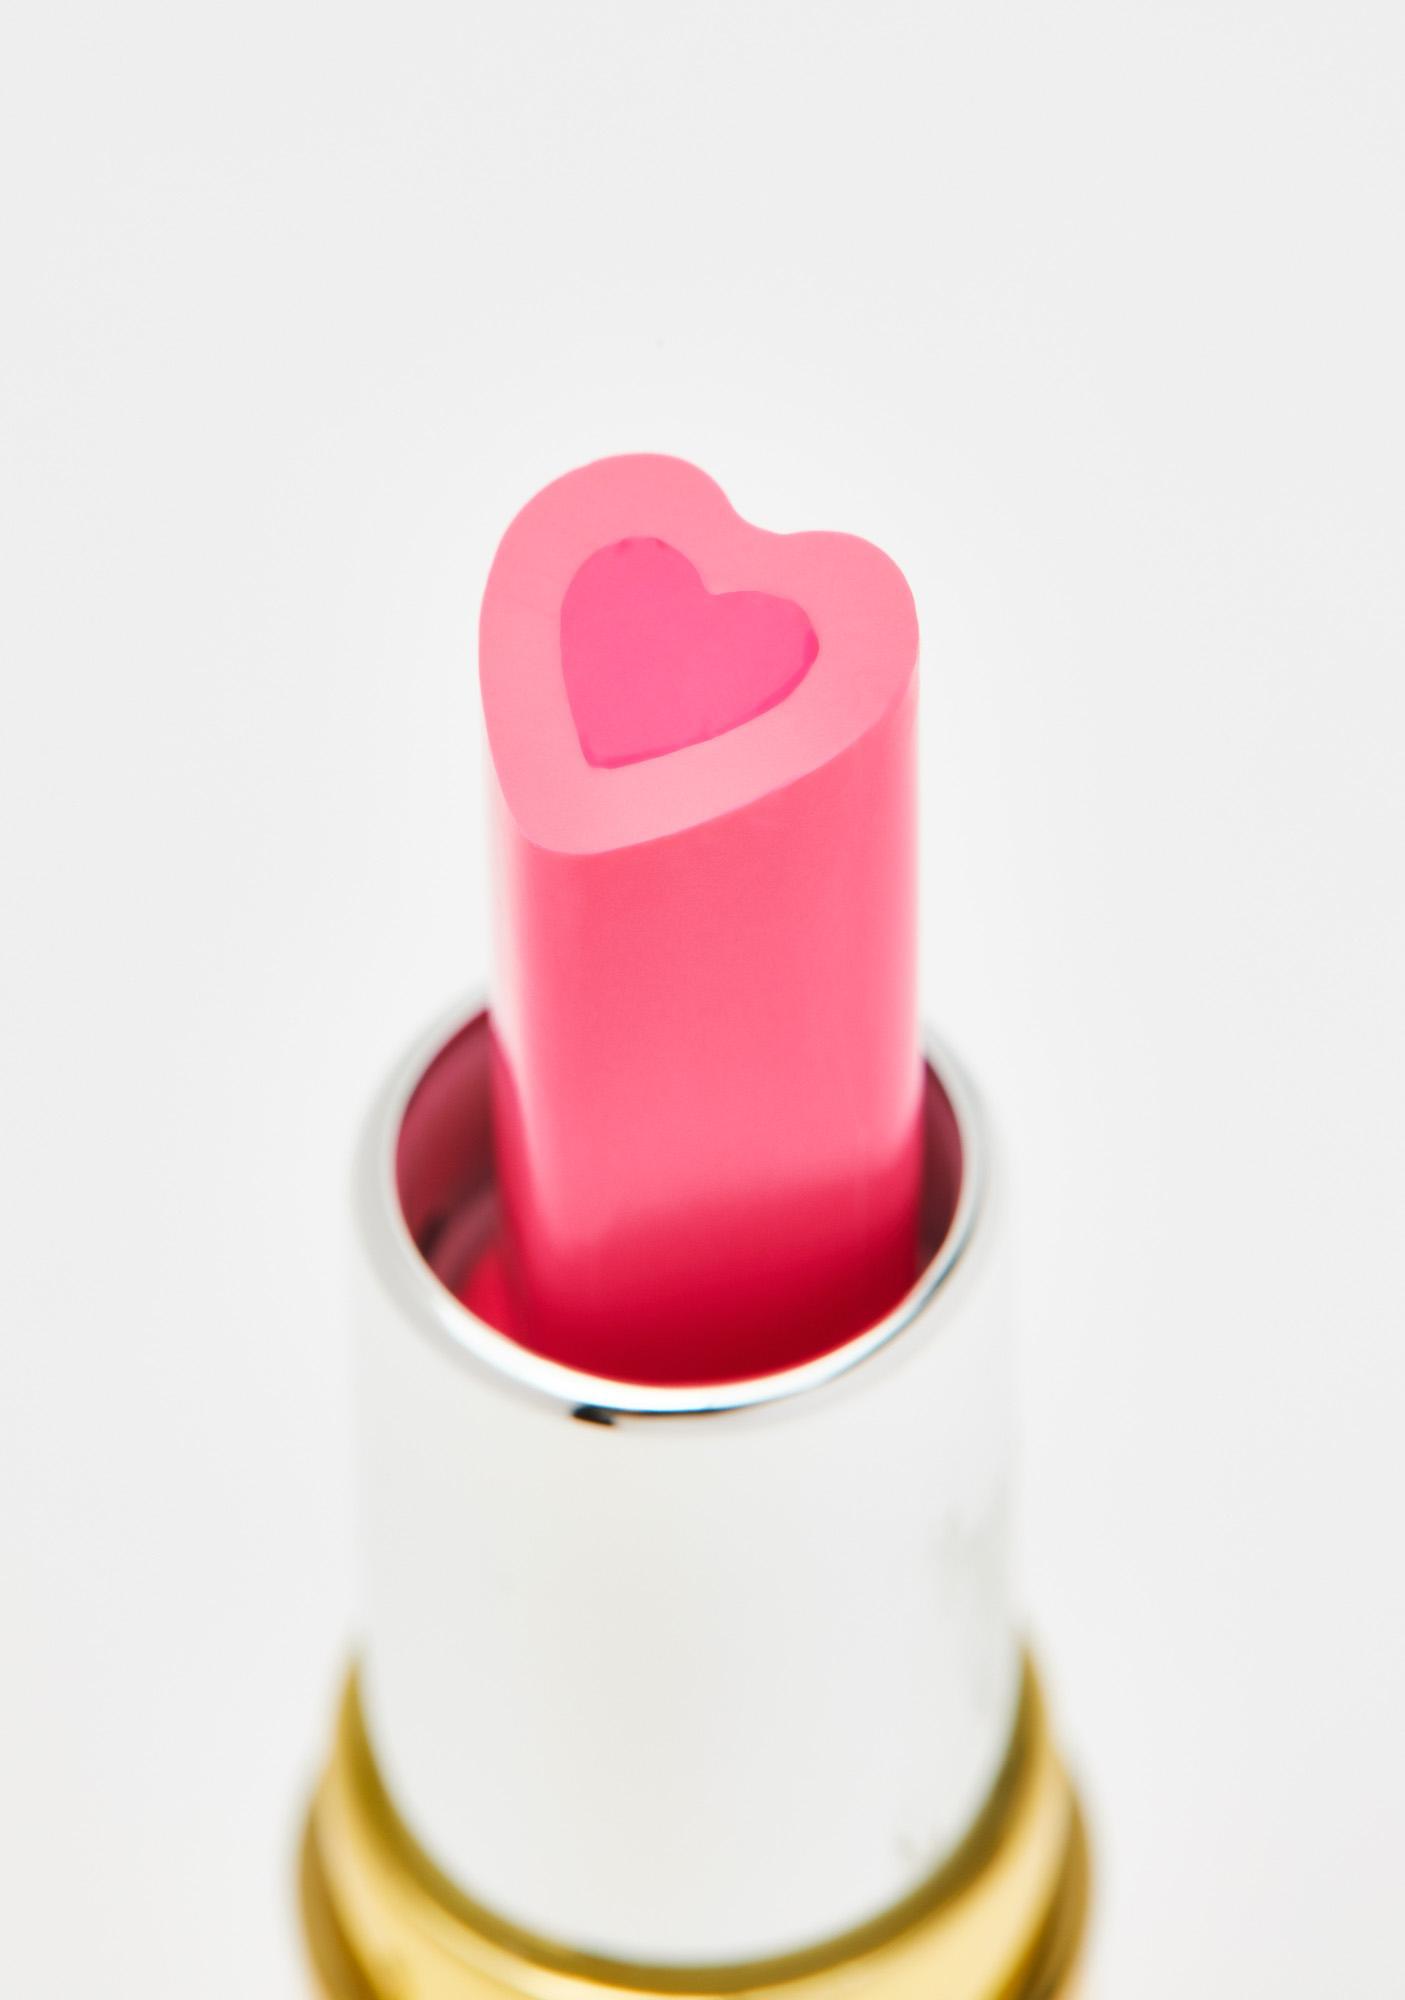 Winky Lux Be Mine Steal My Heart Lipstick